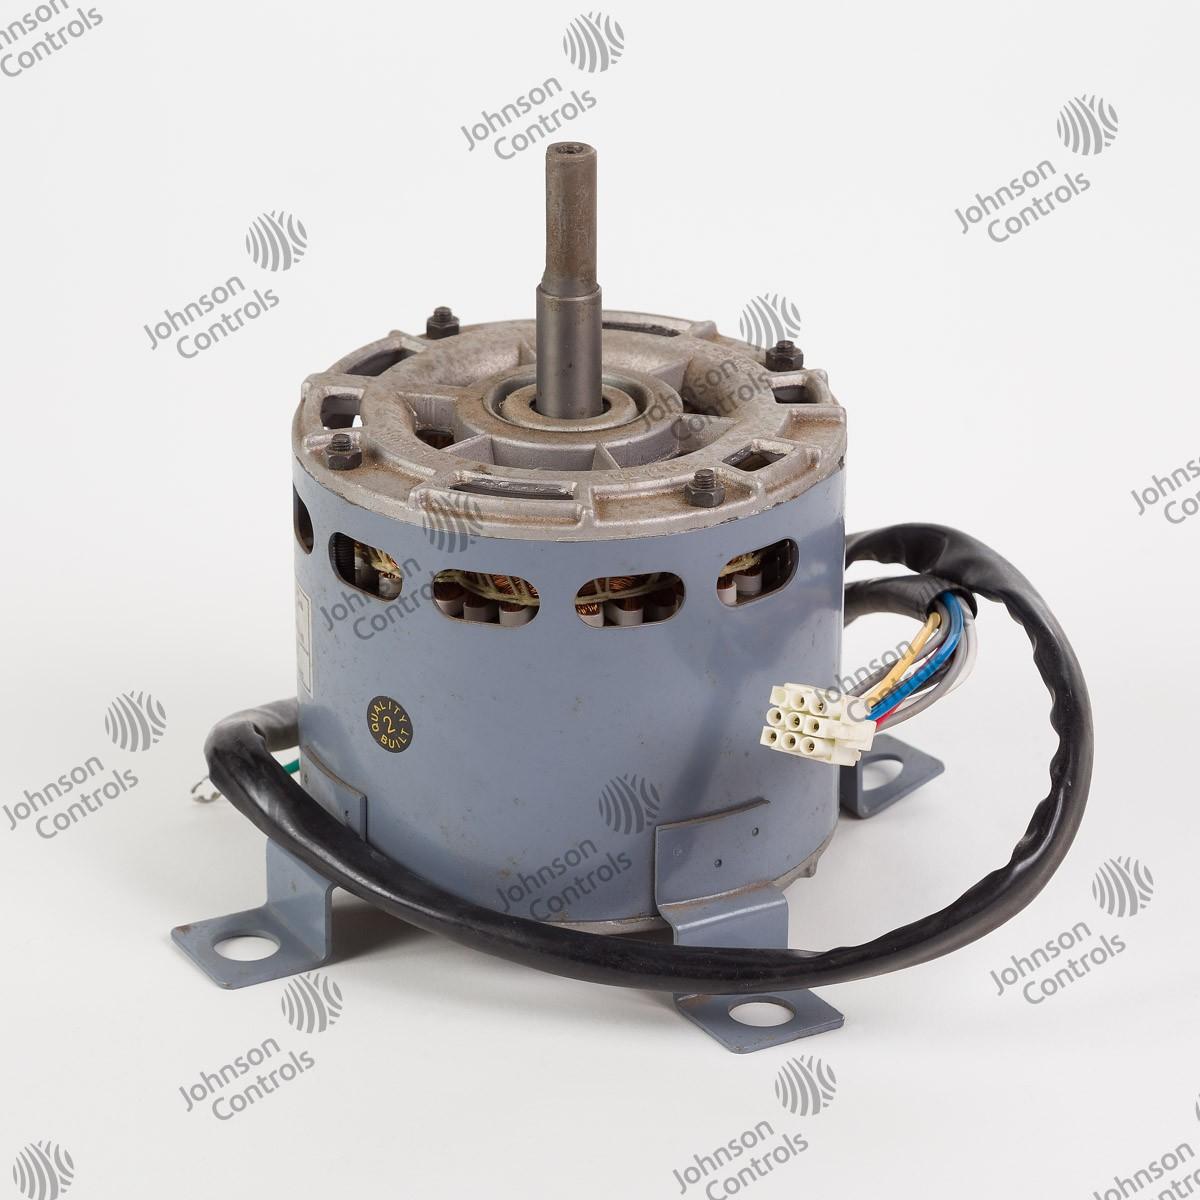 MOTOR DF3G4008K P/ MK 45P     -024T04104-000